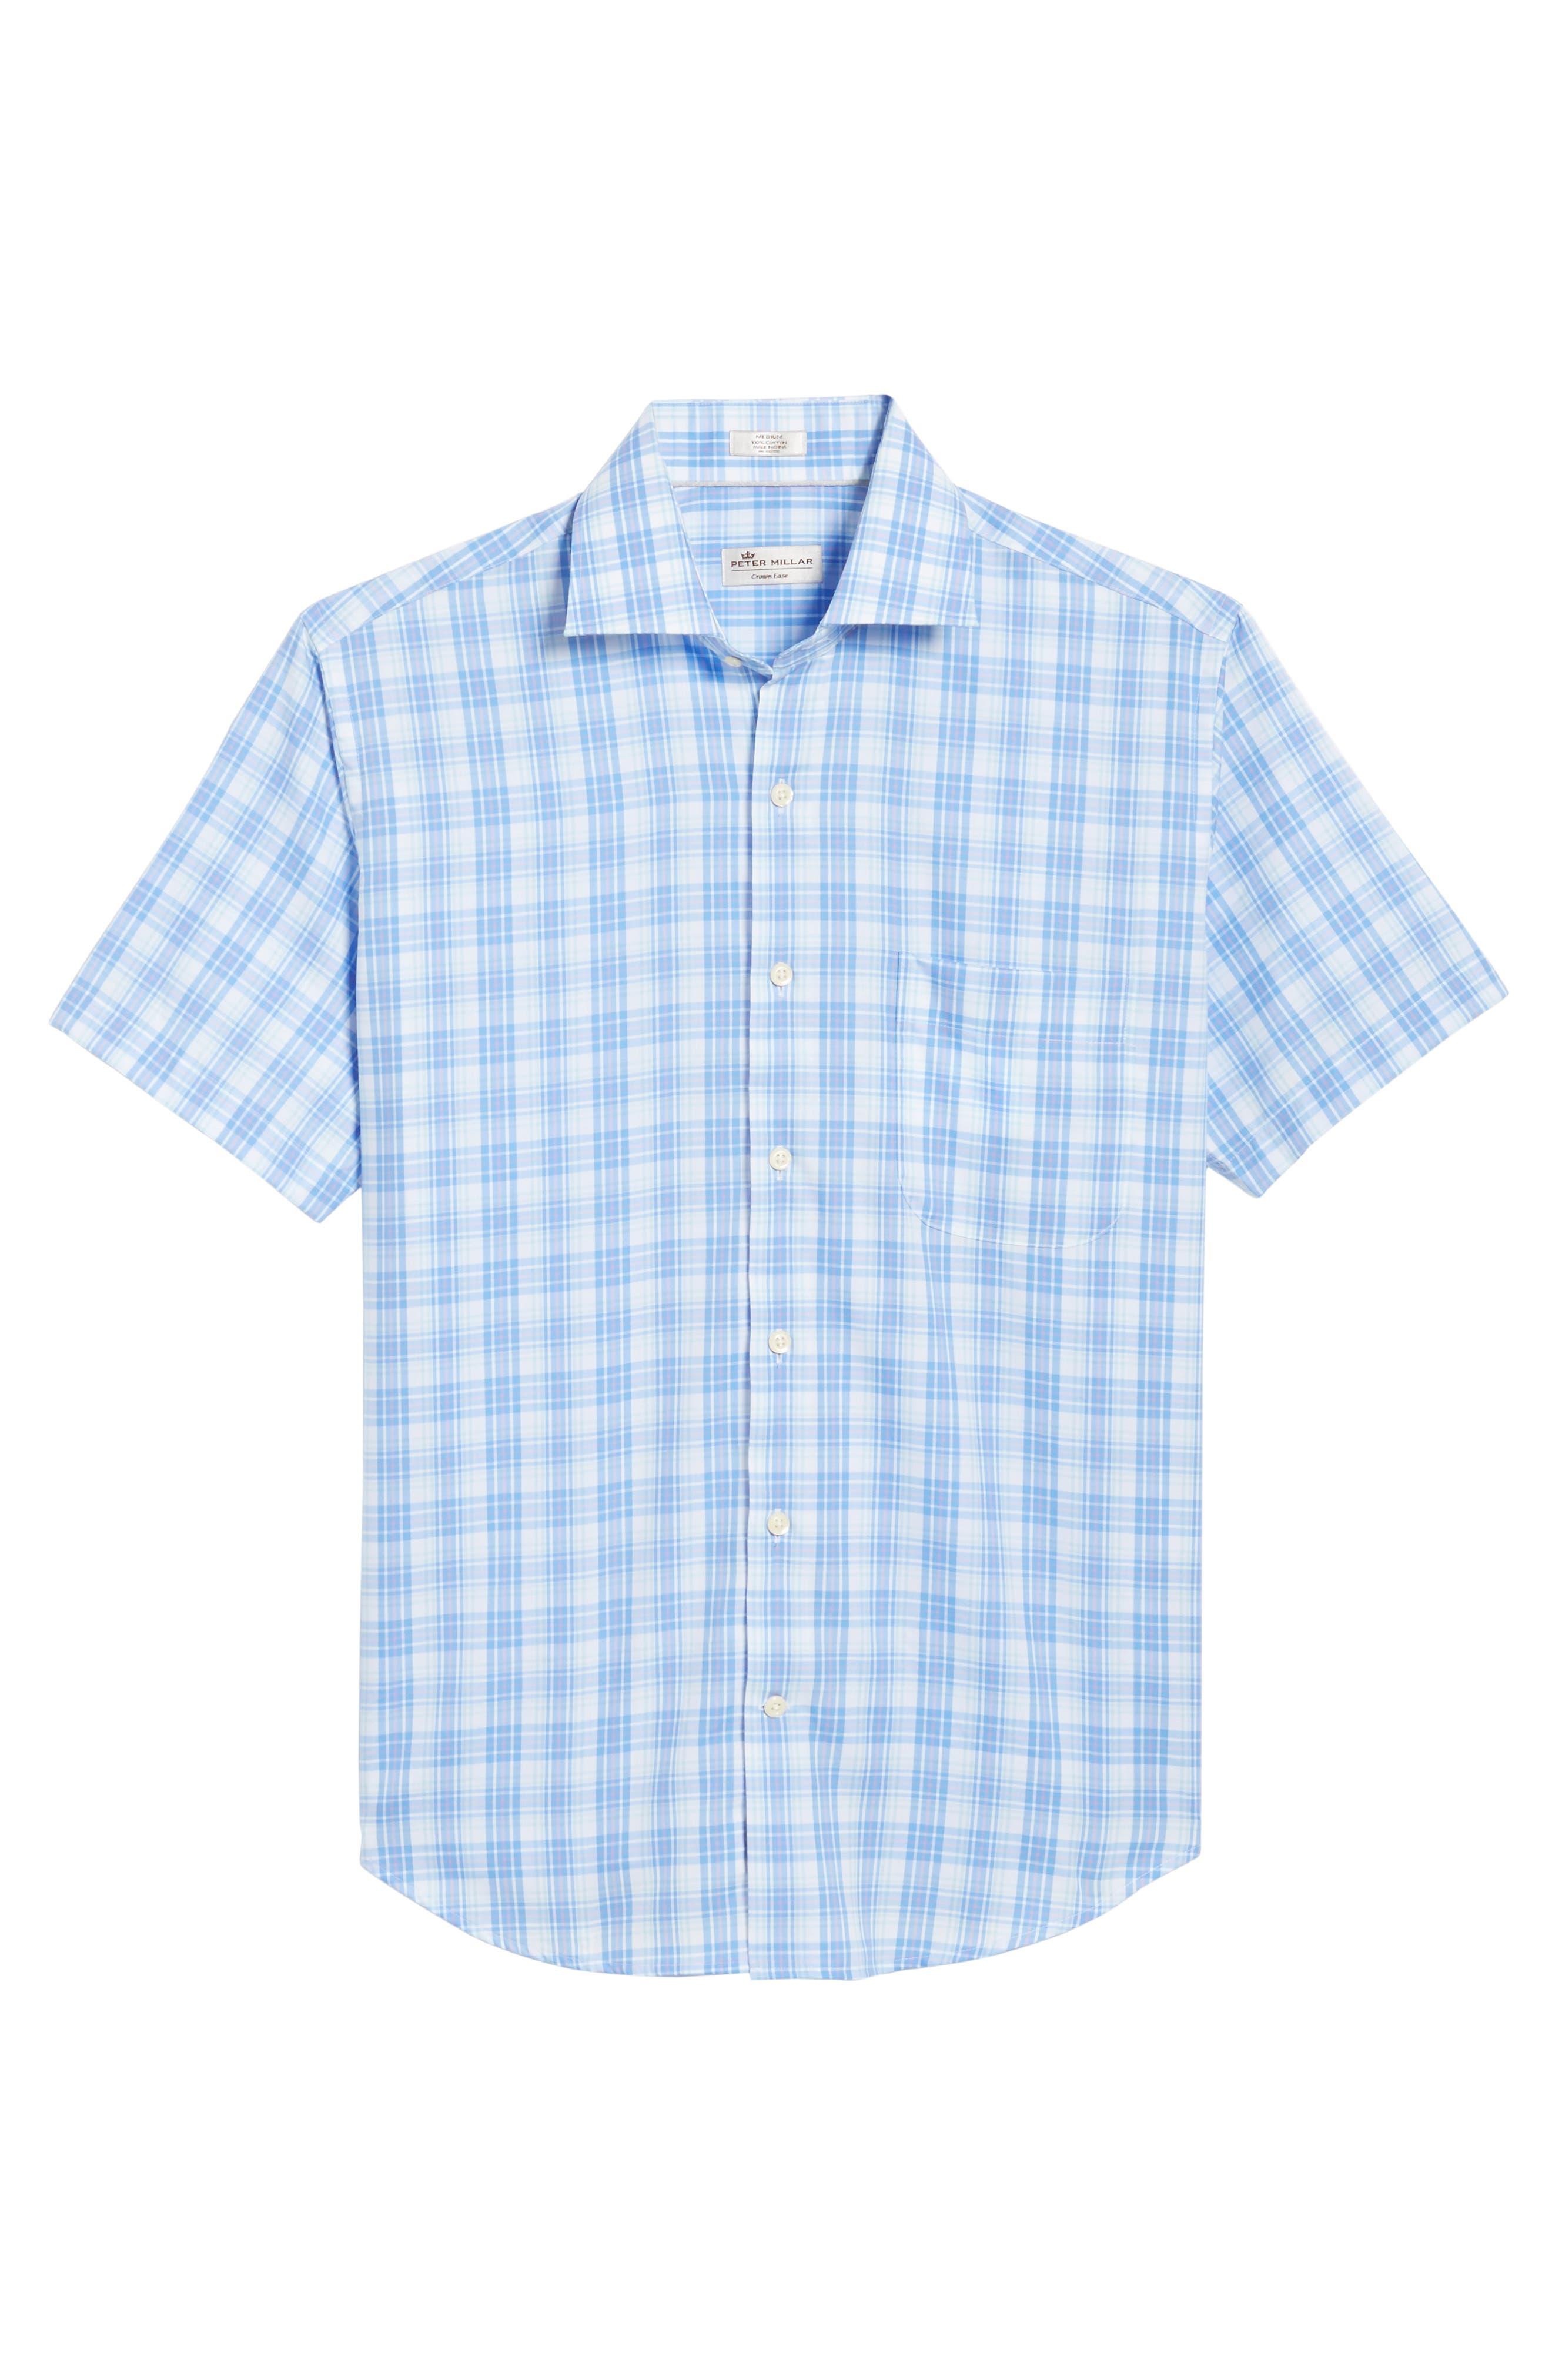 Crown Ease Sloan Regular Fit Plaid Sport Shirt,                             Alternate thumbnail 6, color,                             ATLAS BLUE